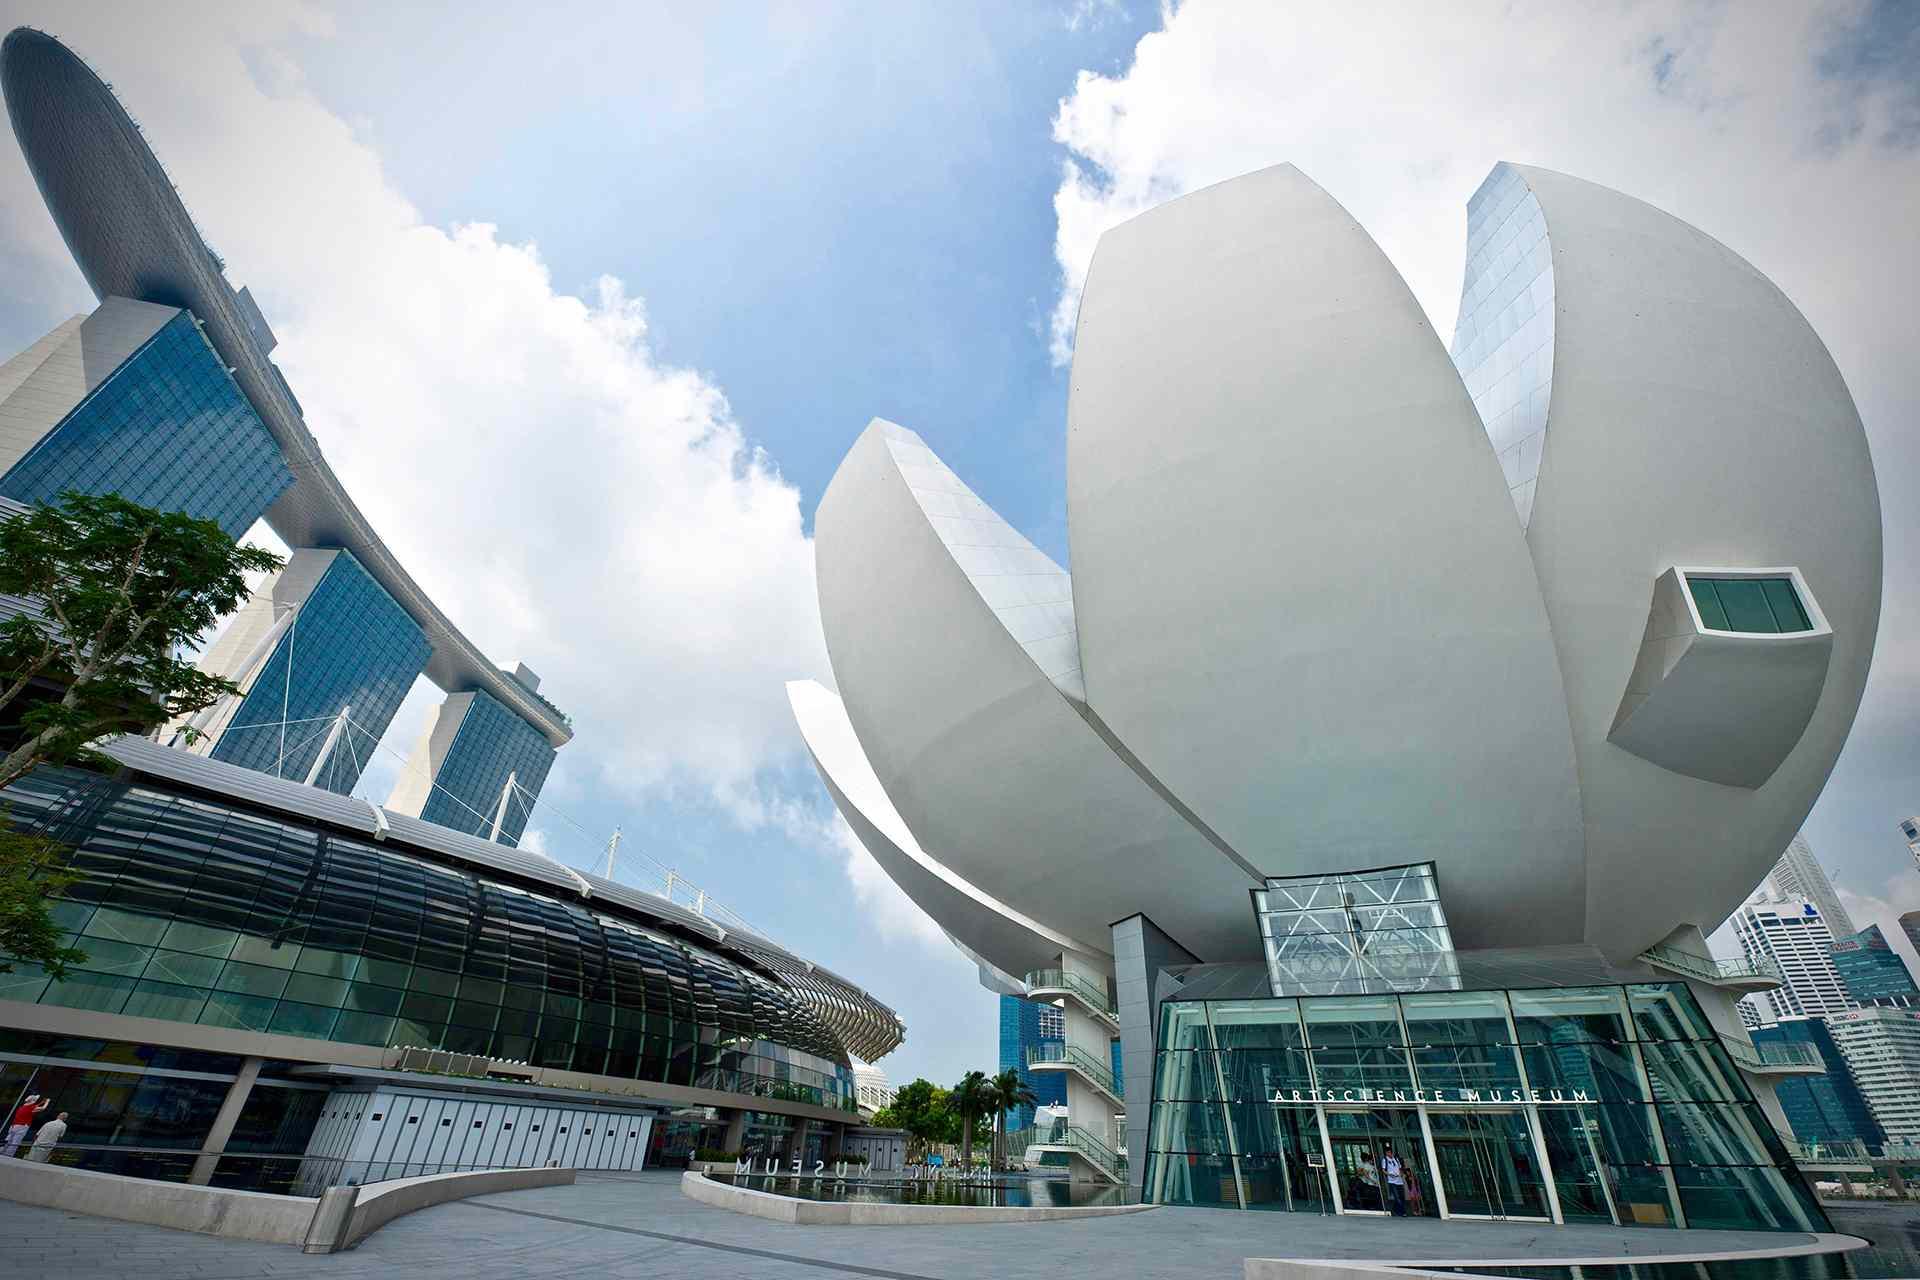 ArtScience Museum in front of Marina Bay Sands